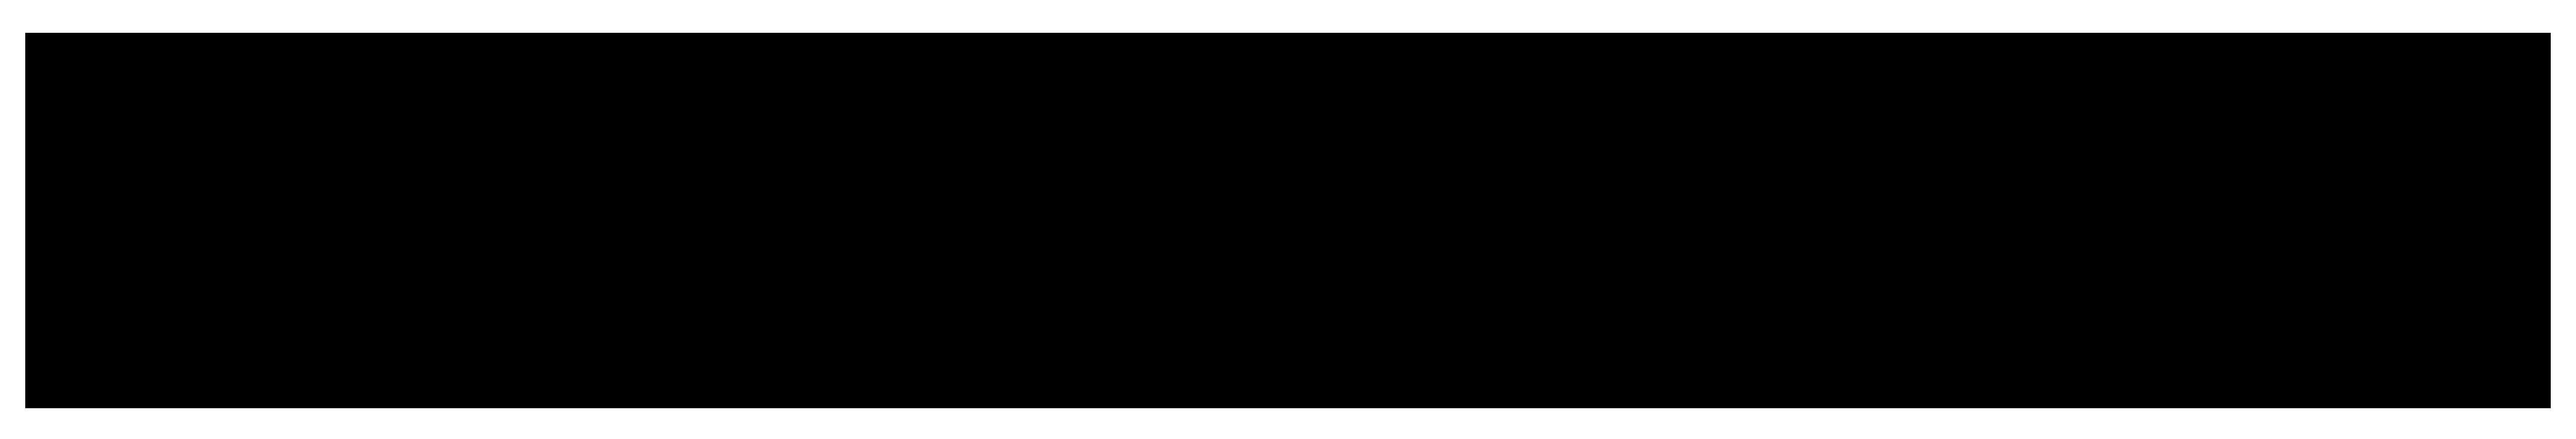 topman � logos download